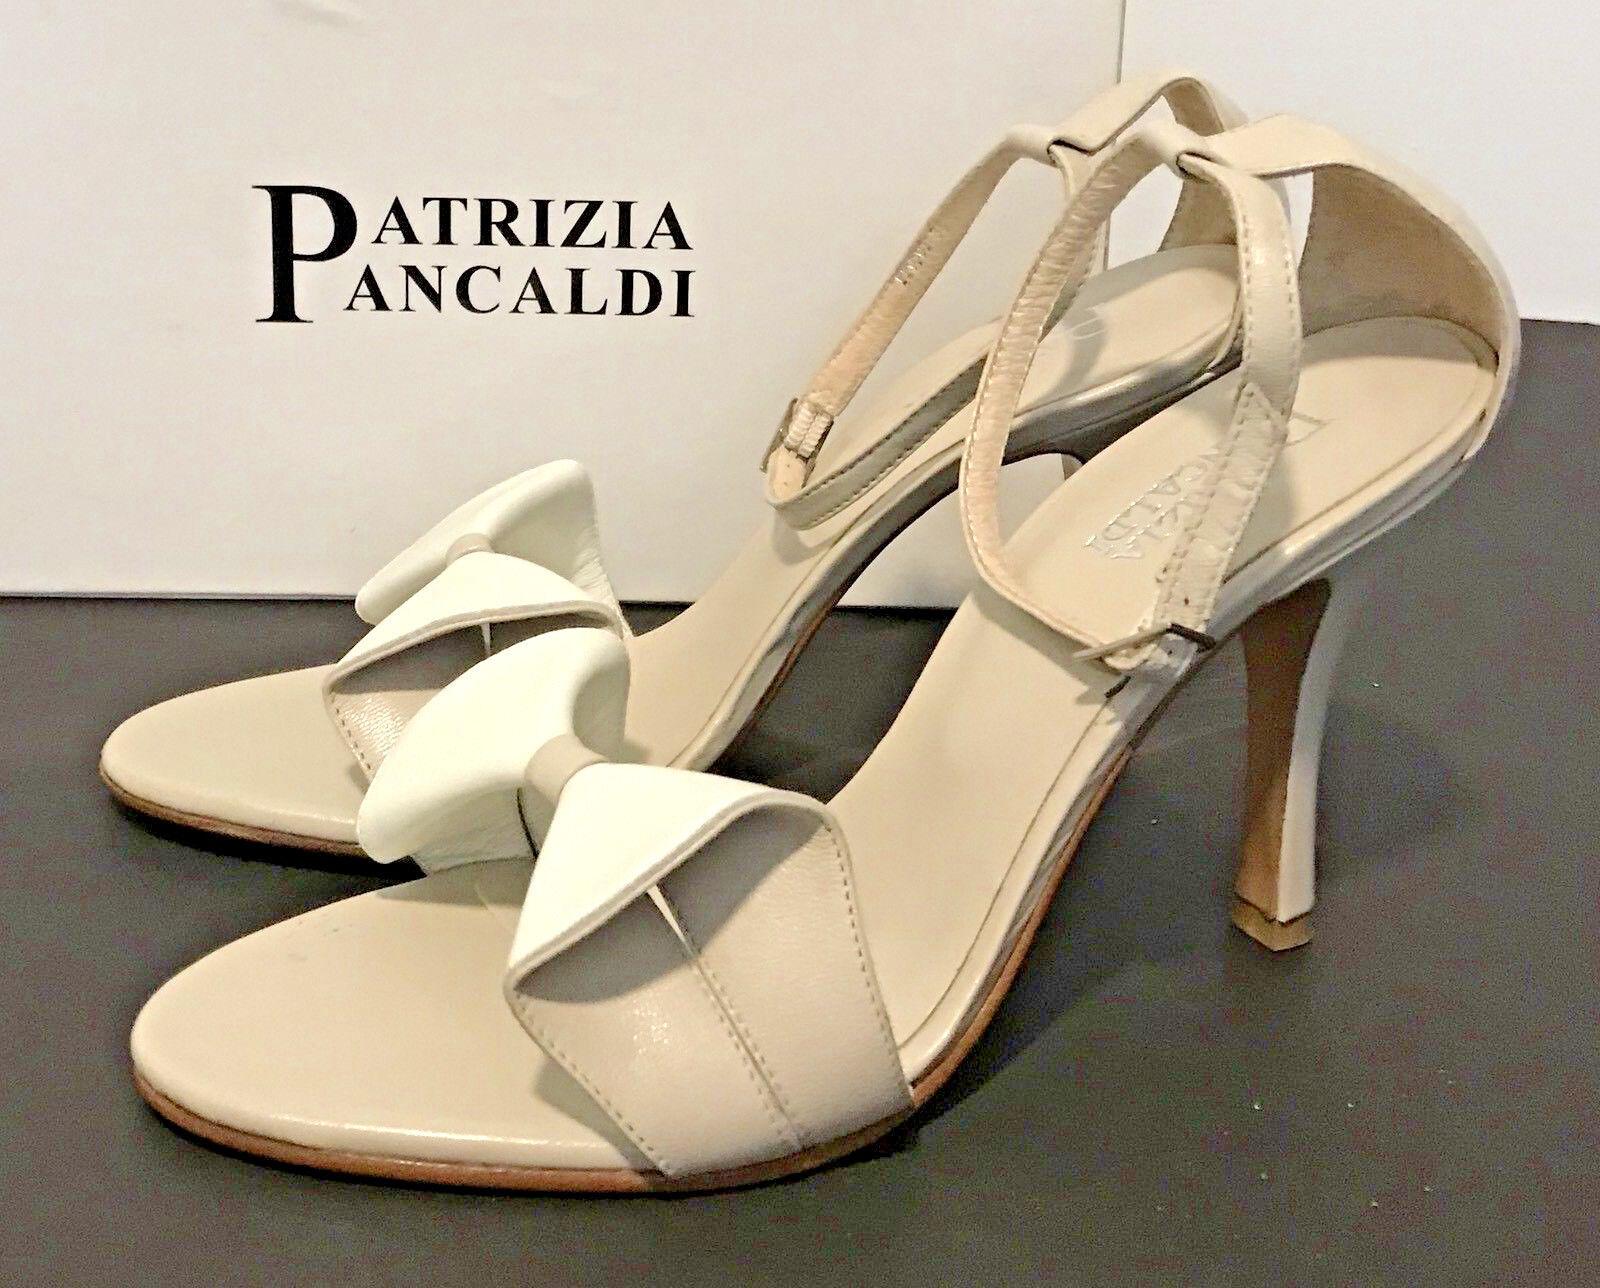 Patrizia Pancaldi Designer Nappa cuir talons, NEUF avec boite, made in